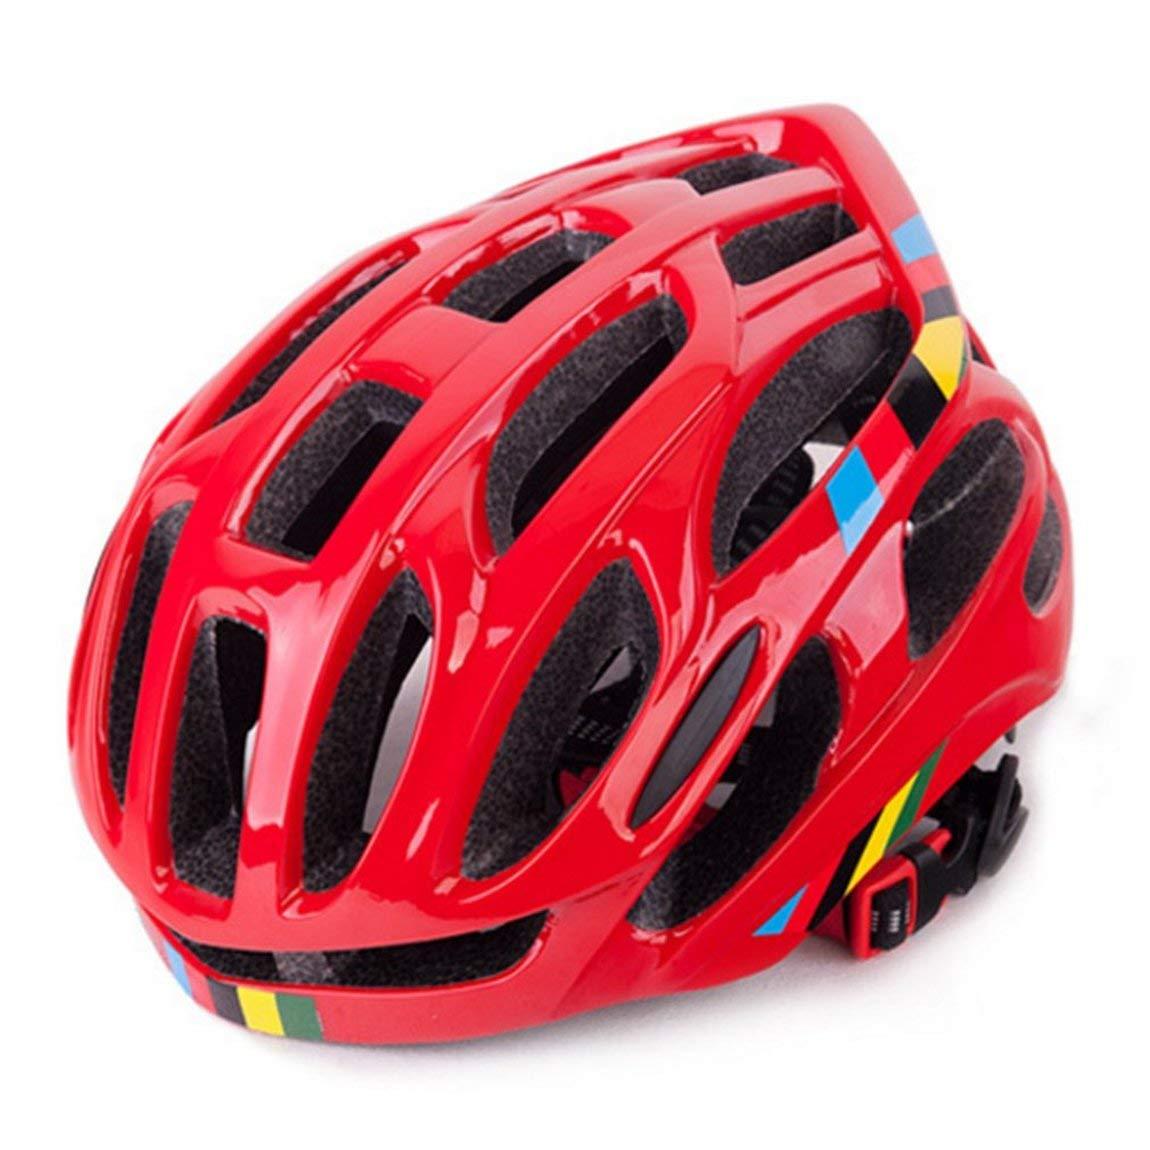 Soft Ventilation Cycling Bicycle Helmet Breathable Bike Helmet Fully-Molded Road Mountain MTB Helmet Best Gift